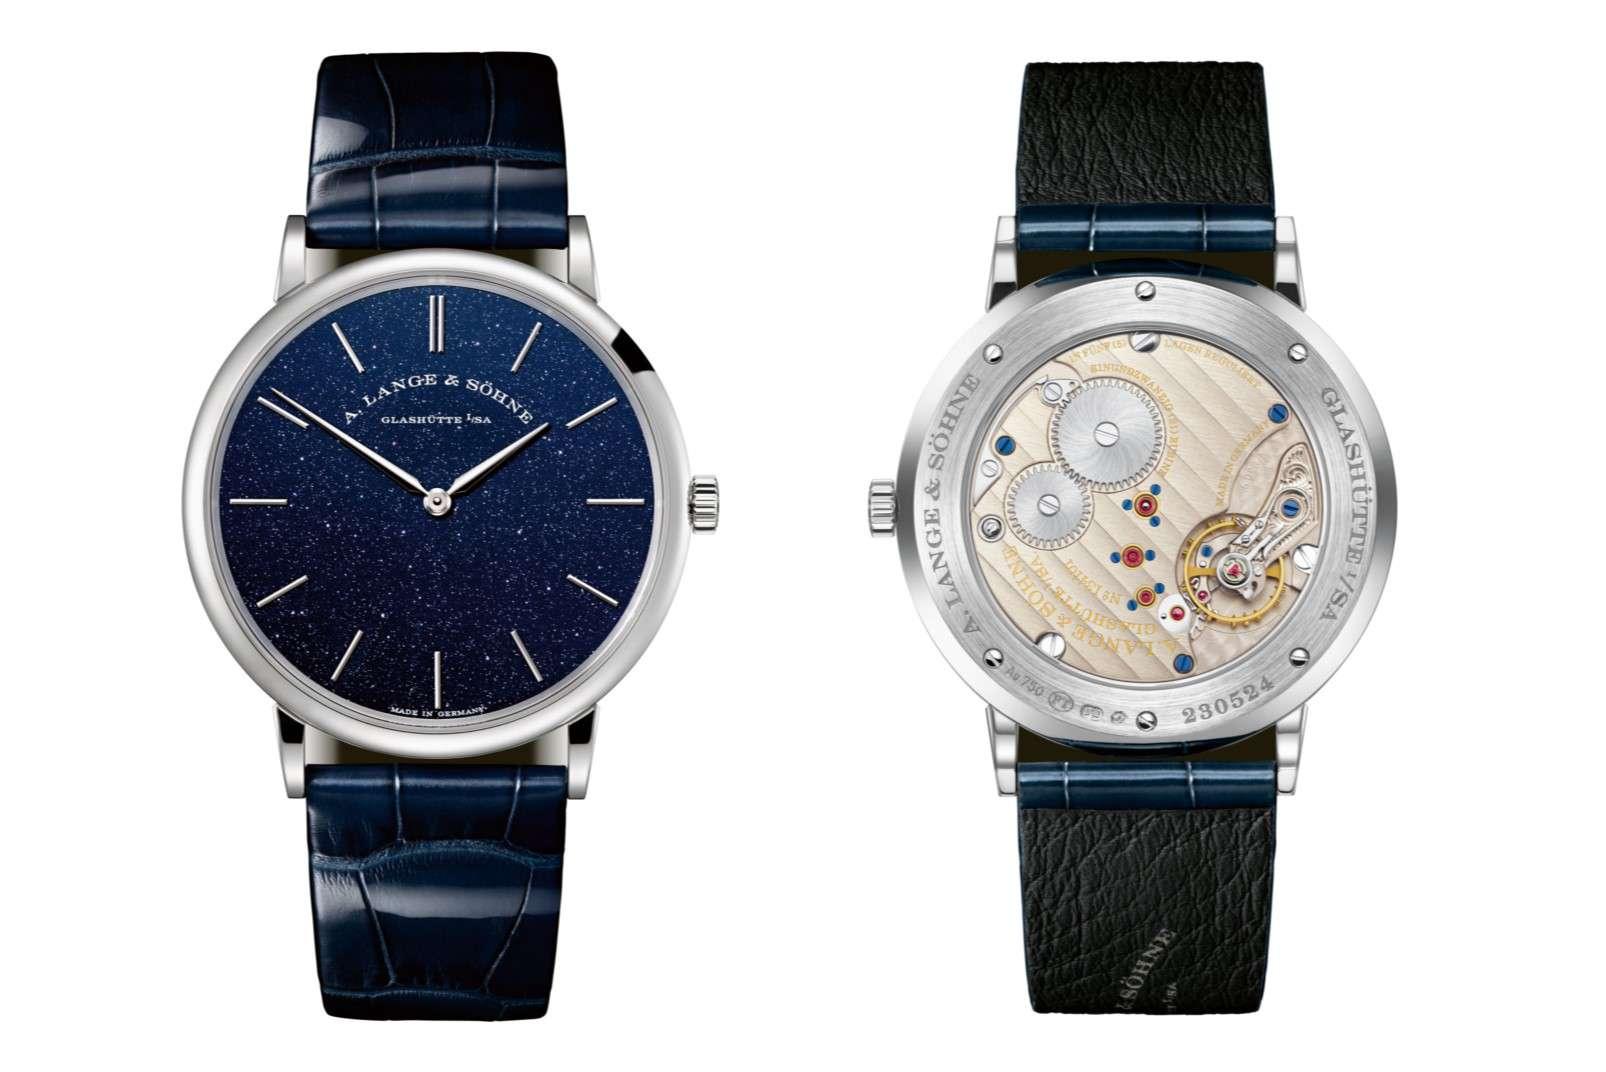 A Lange Sohne Saxonia Thin dress watch